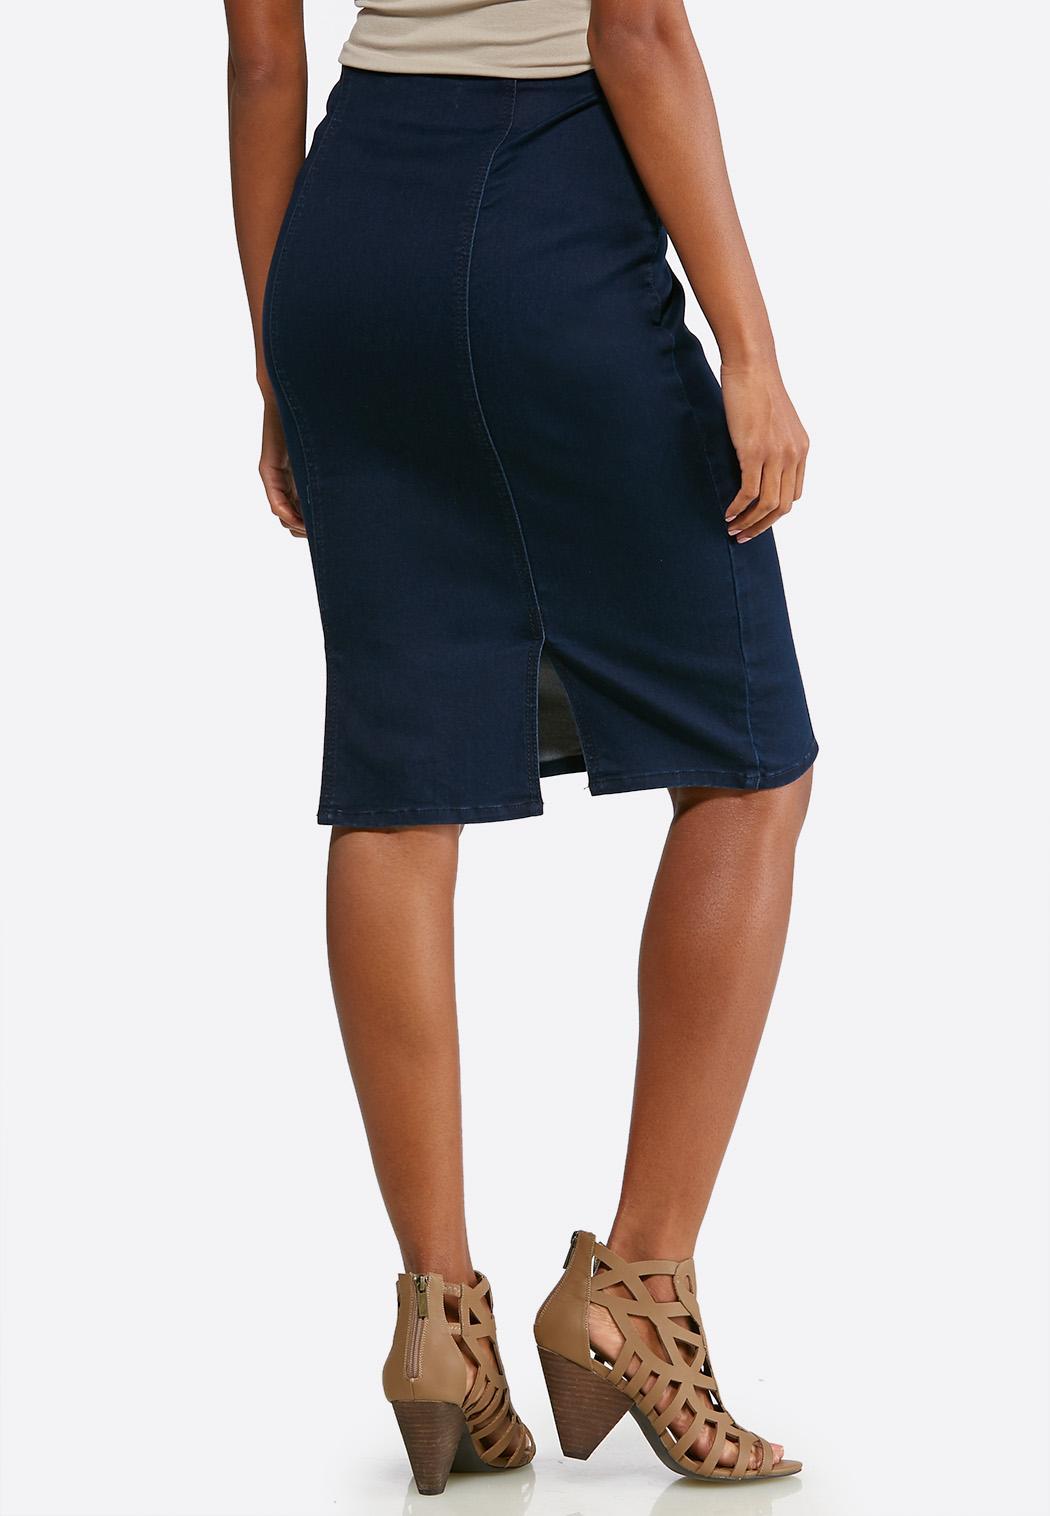 Plus Size Pull-On Denim Pencil Skirt (Item #43710686)